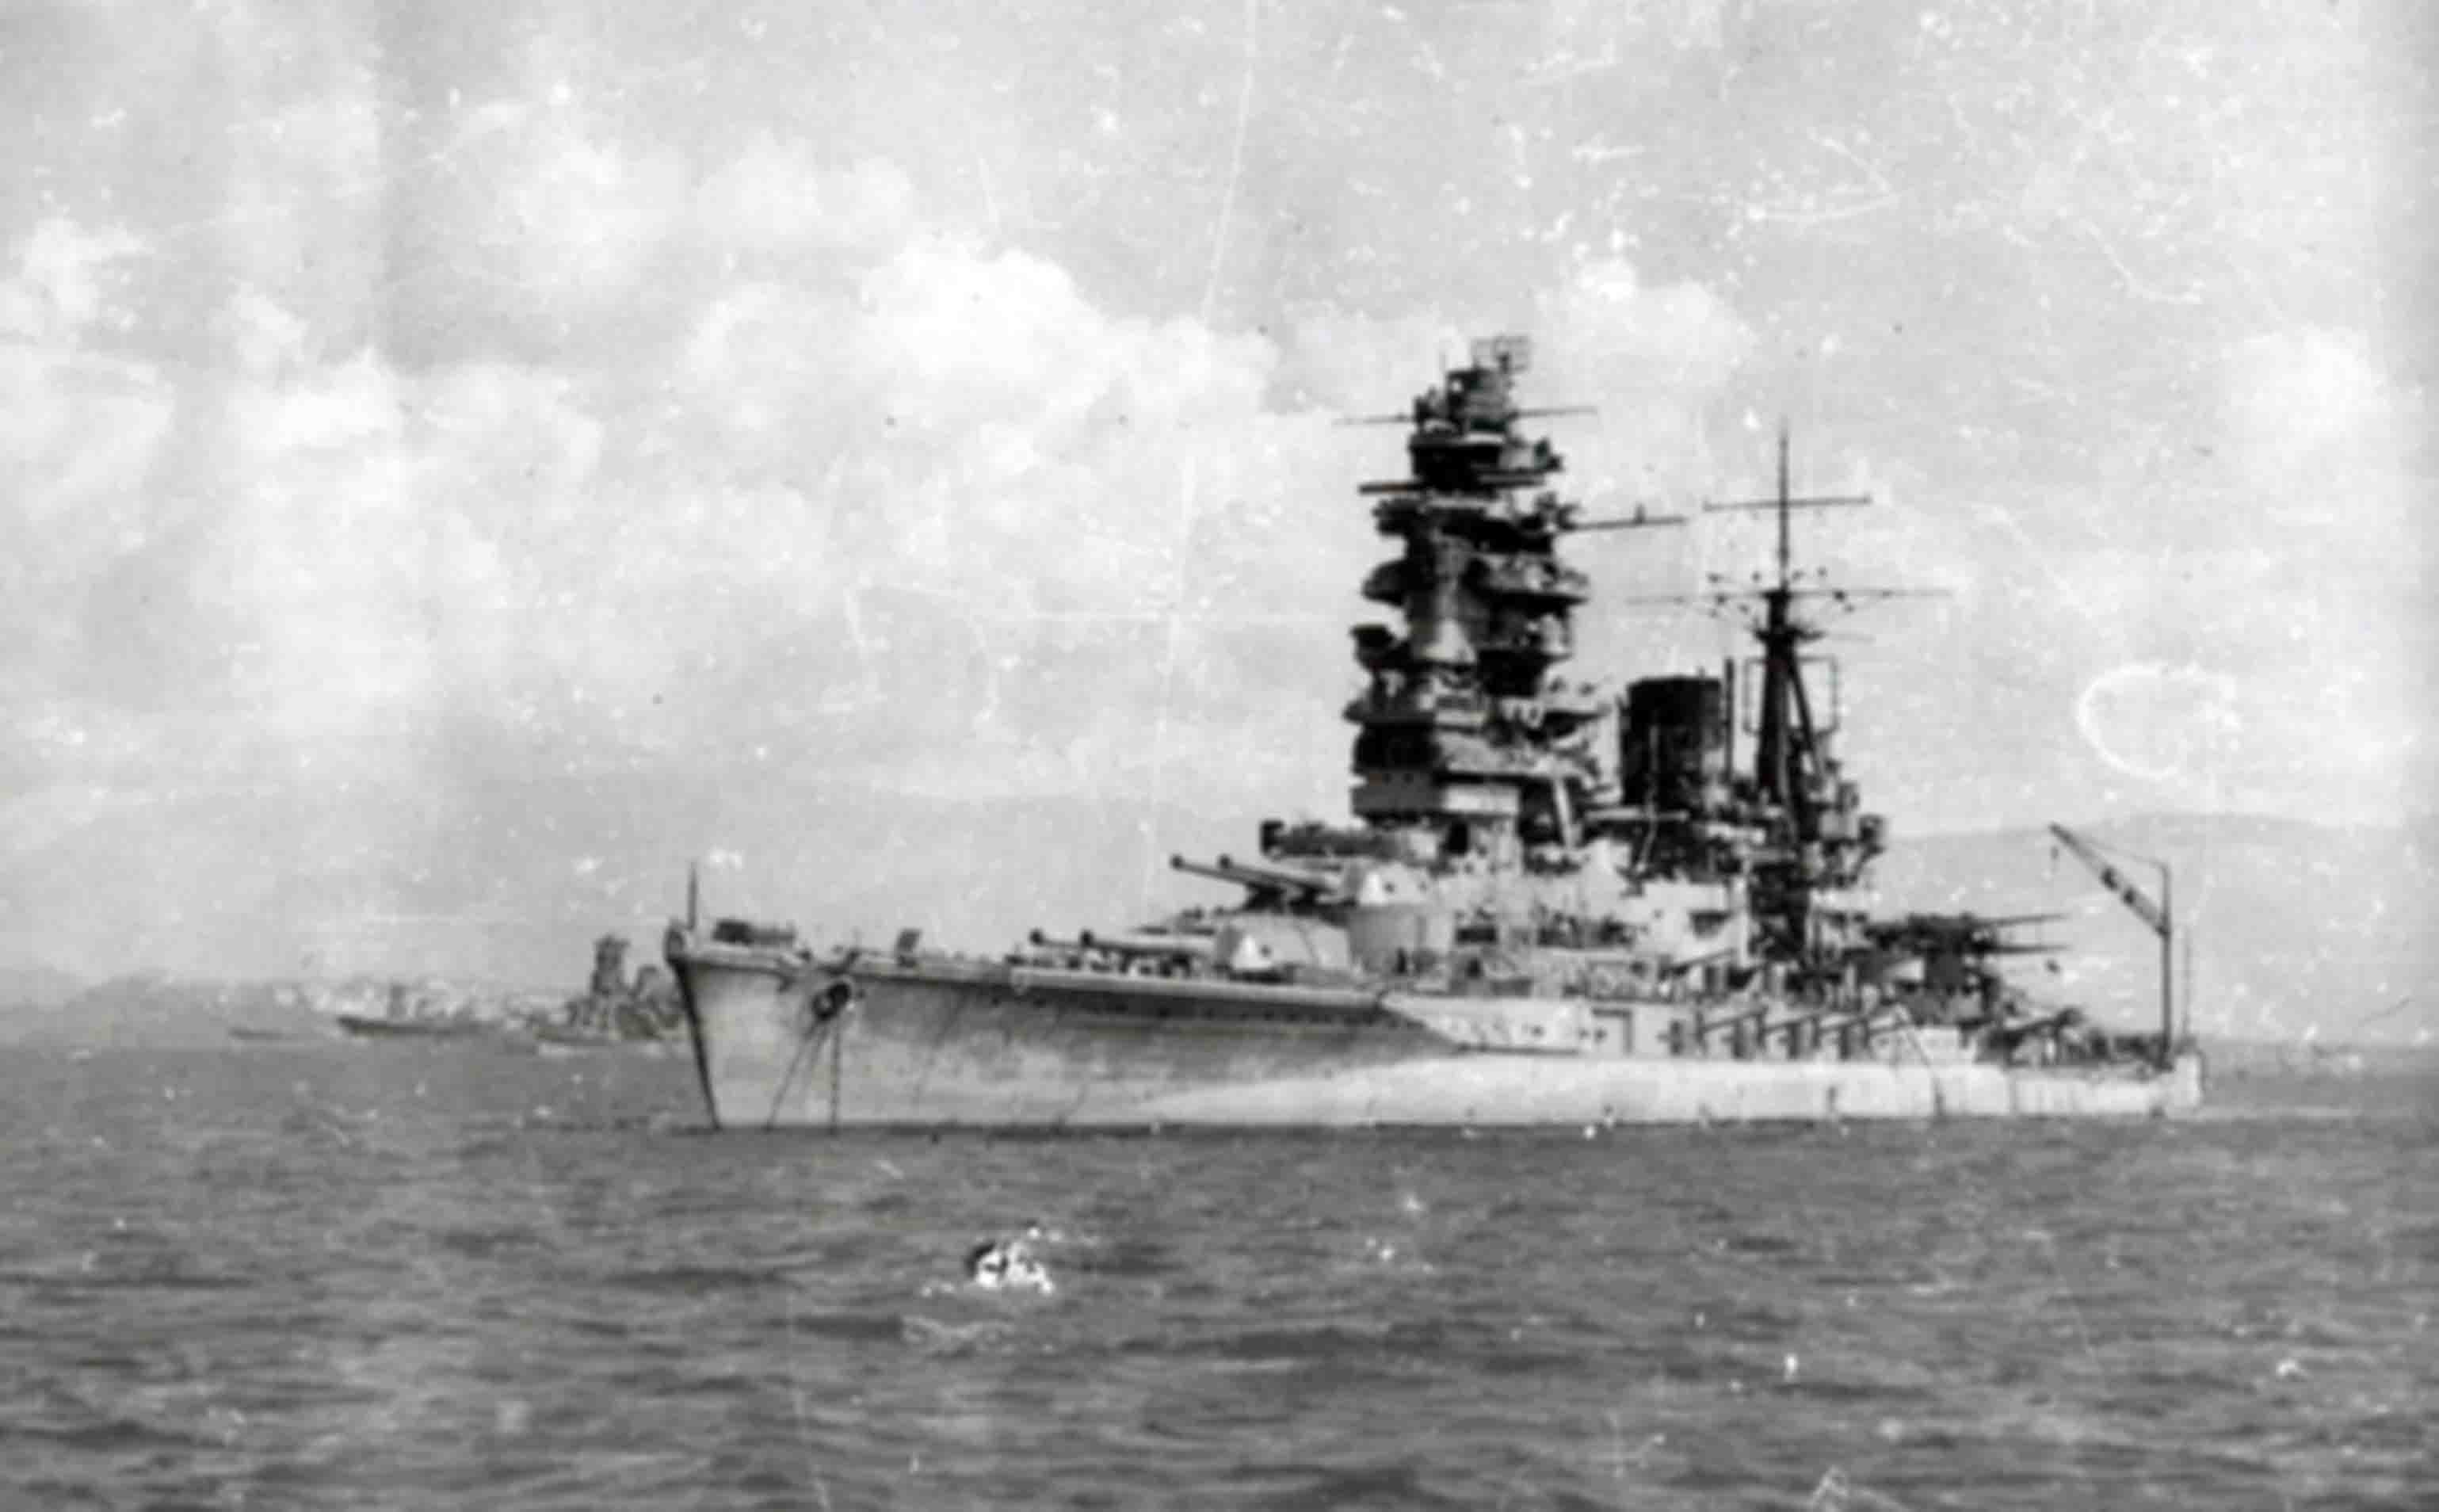 Nagato battleship